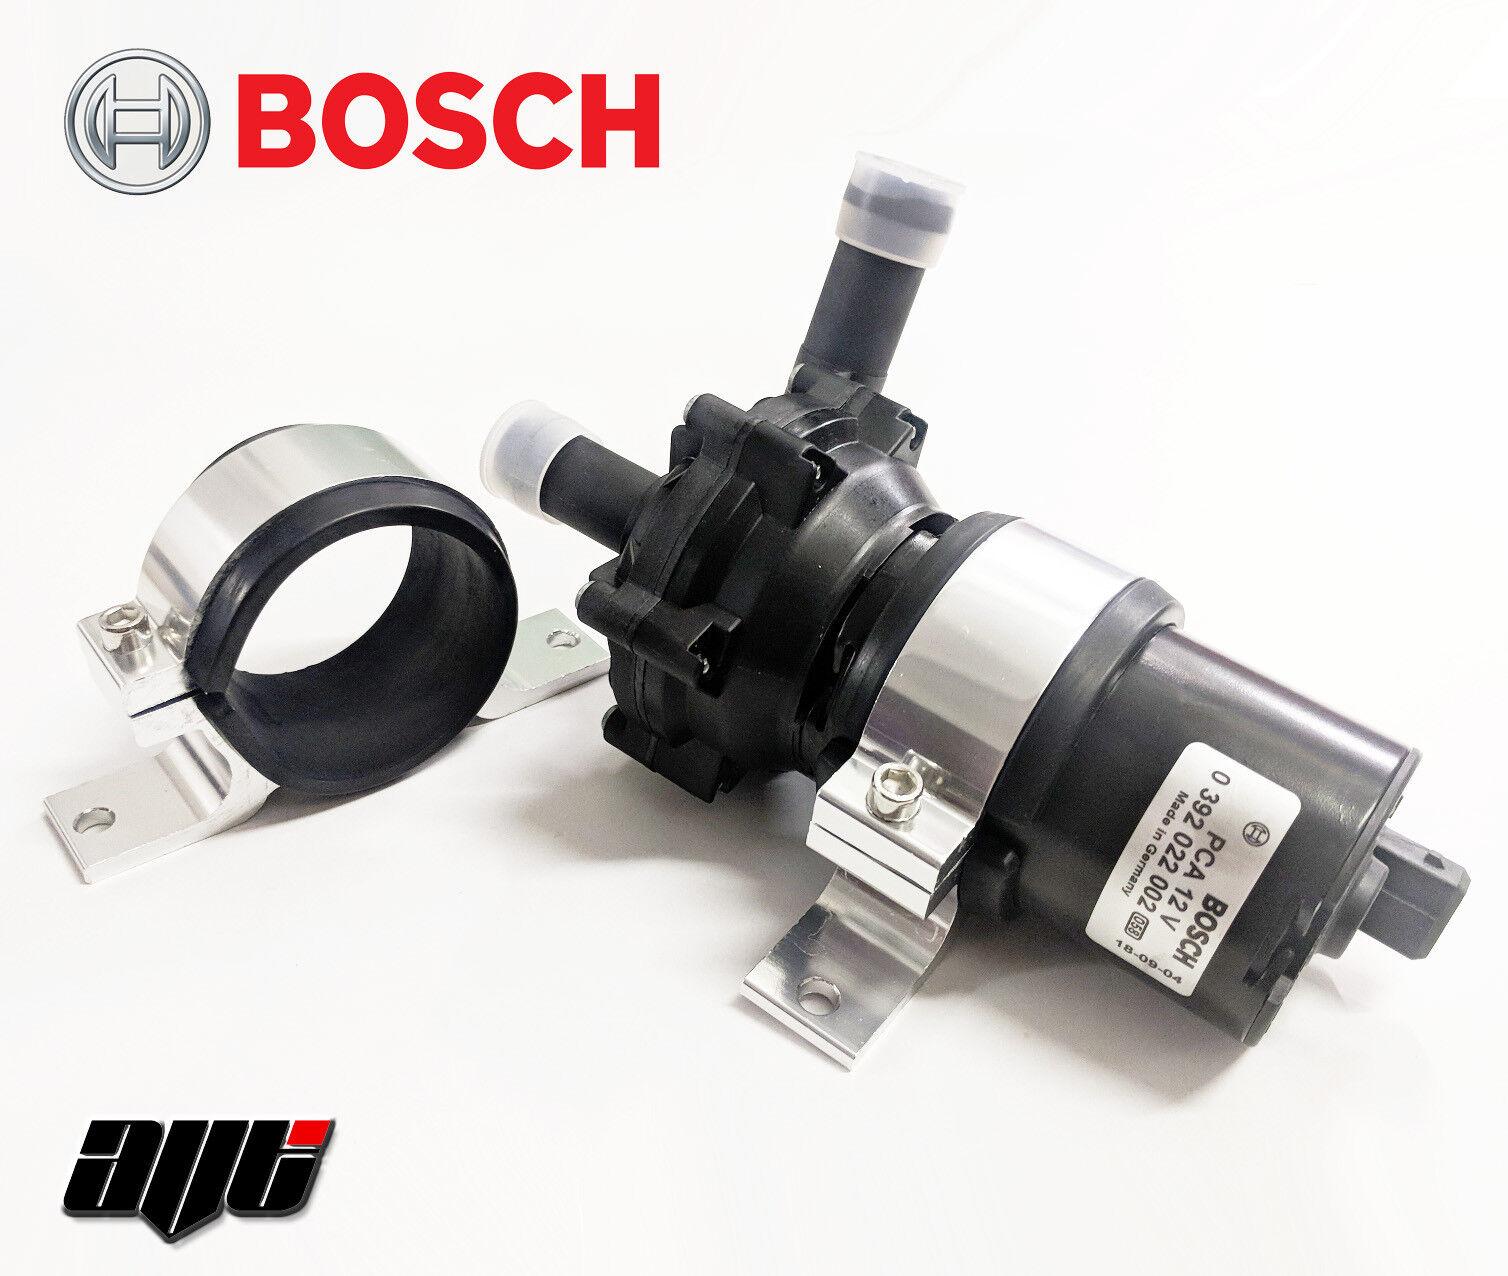 Details about 12v Intercooler Pump Bracket / EWP / Chargecooler Clamp Mount  - 55-62mm Diameter